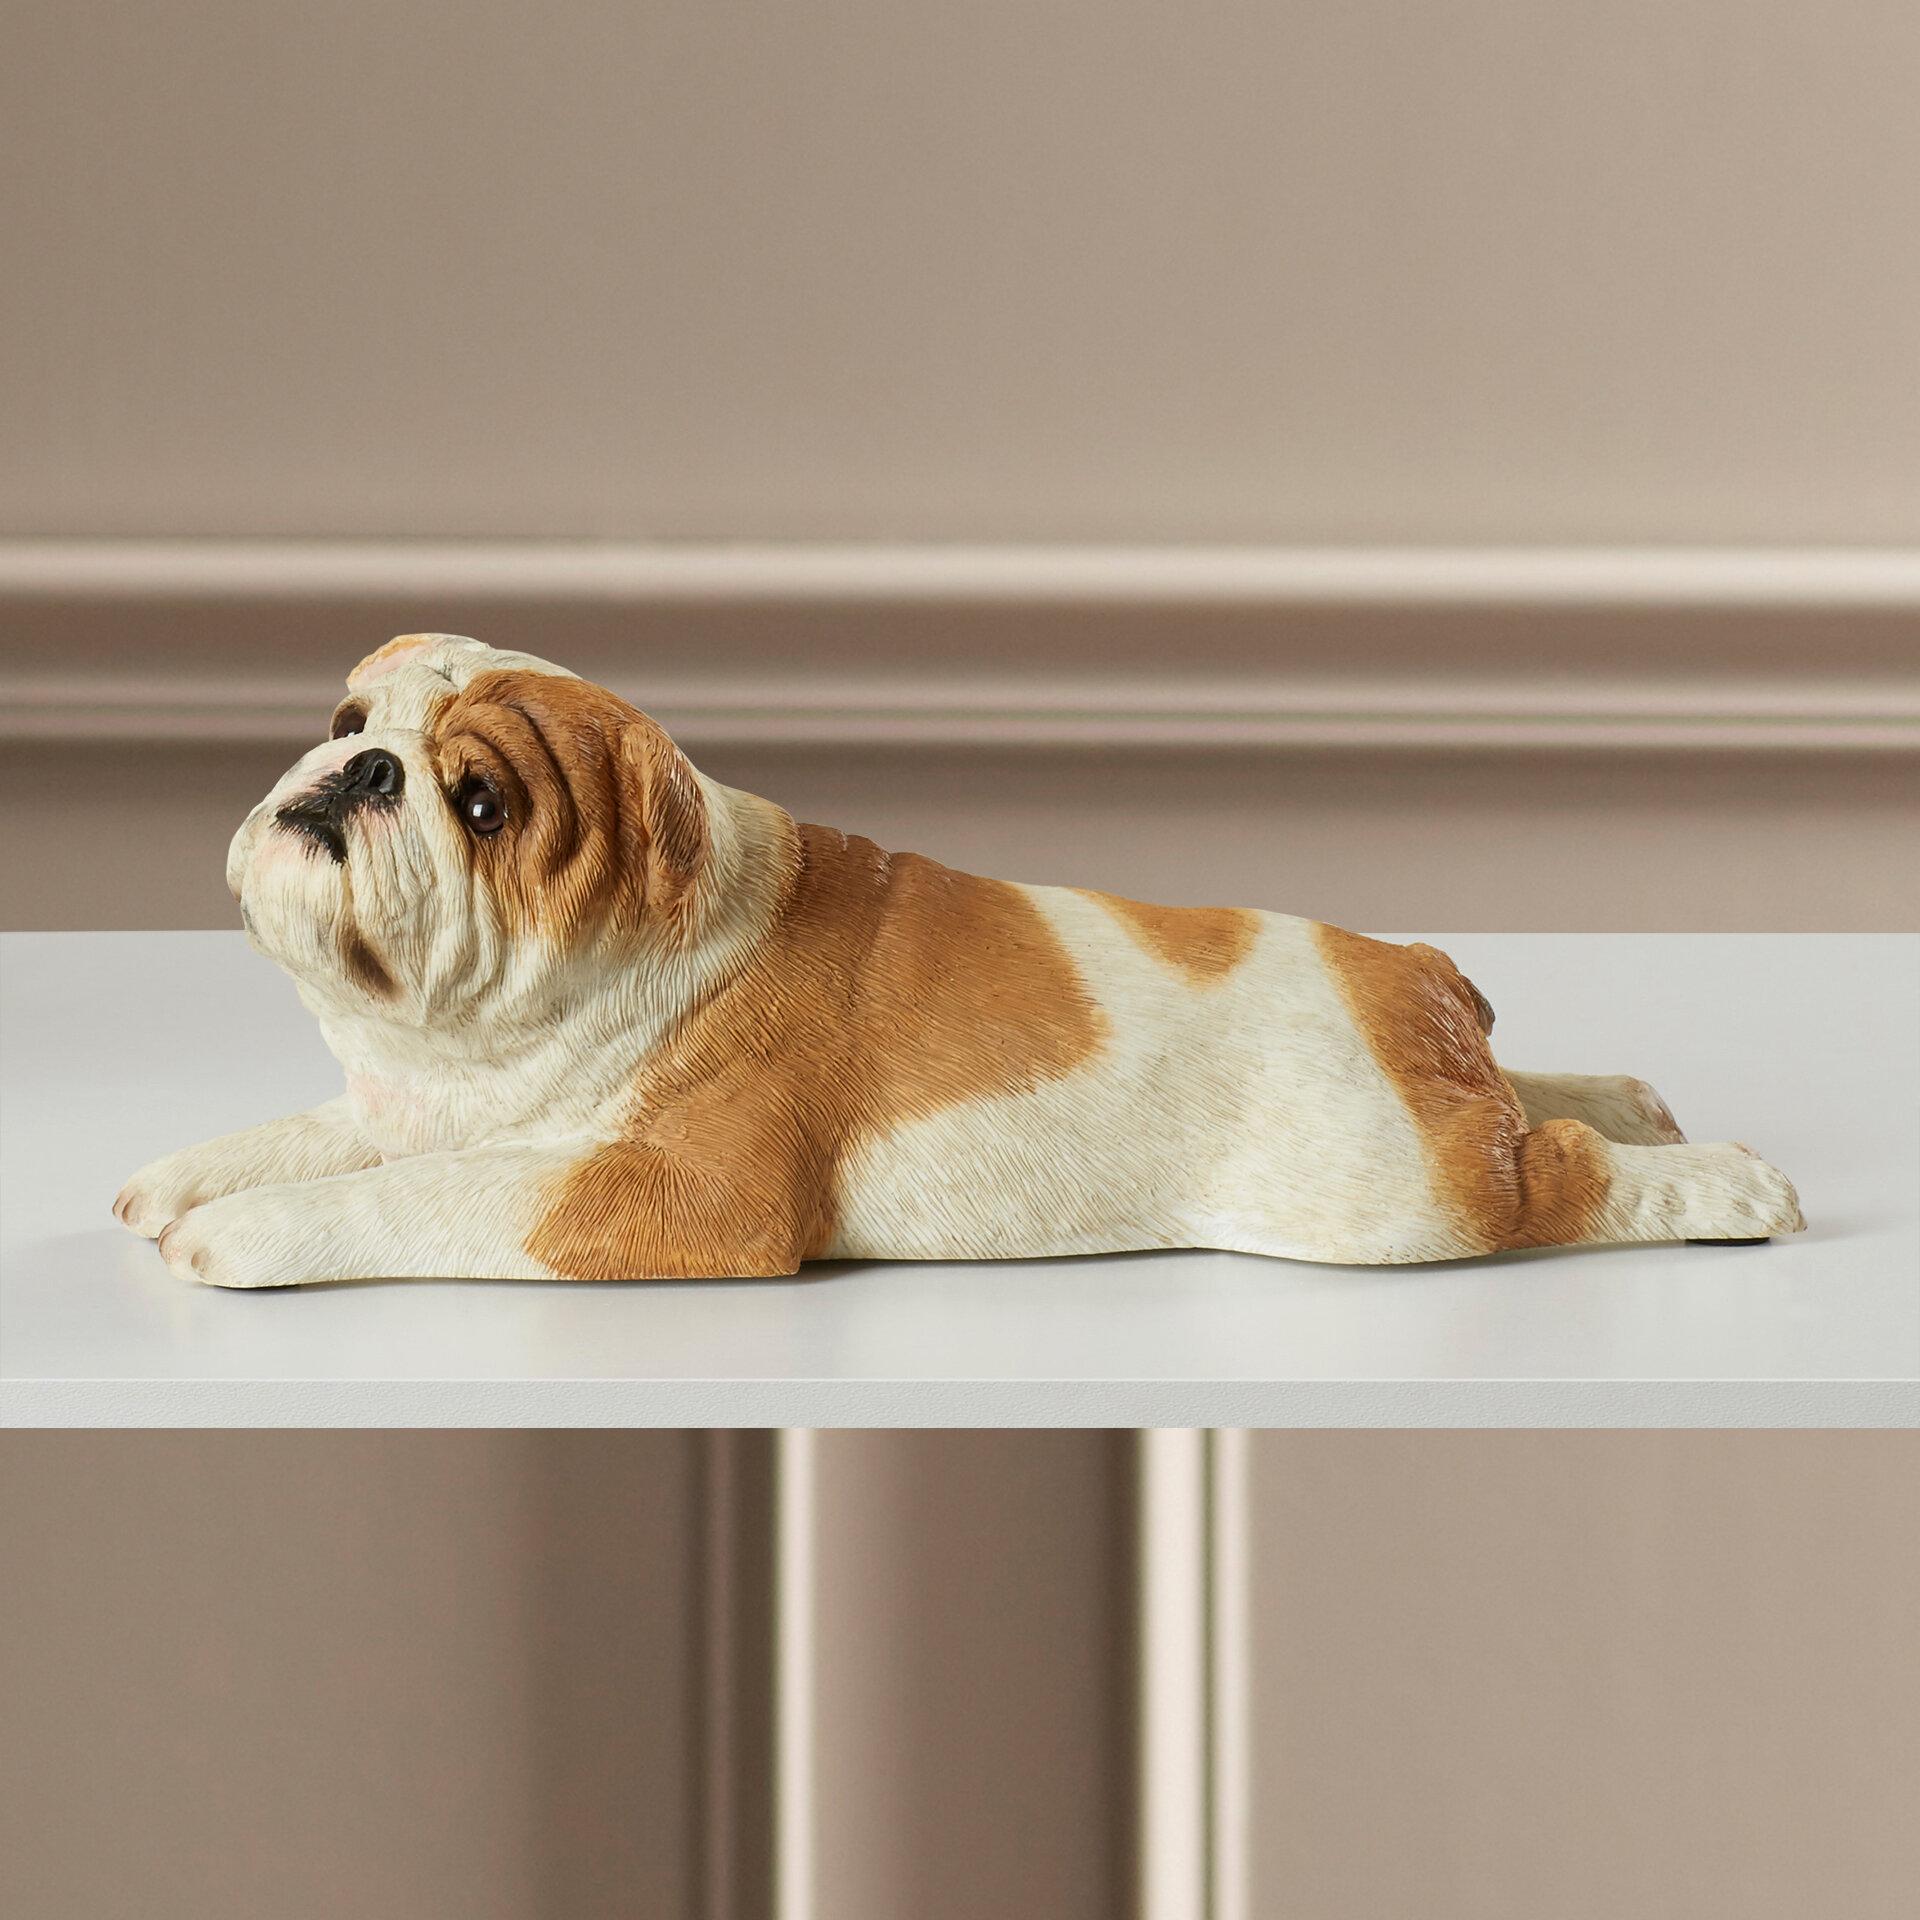 Darby Home Co Bulldog Figurine Reviews Wayfair